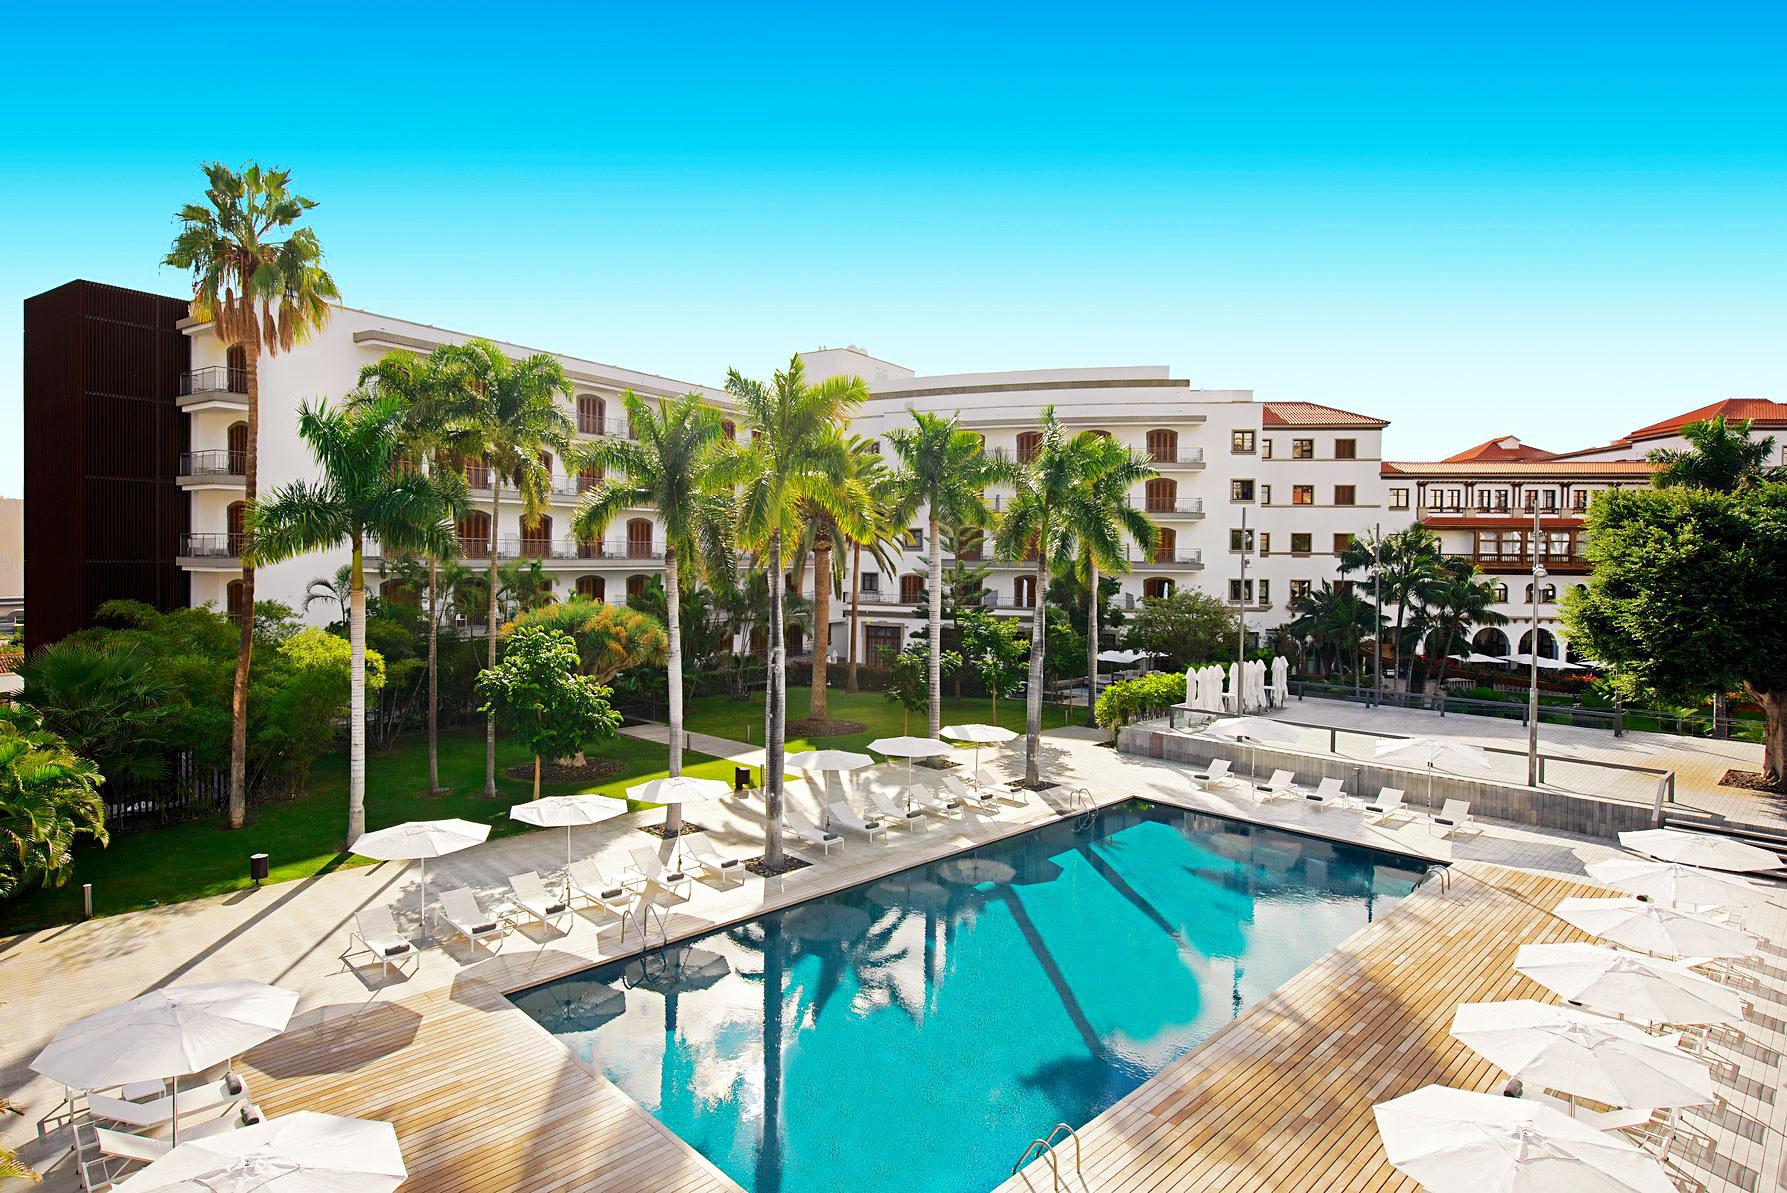 Tenerife's Iberostar Grand Mencey Hotel